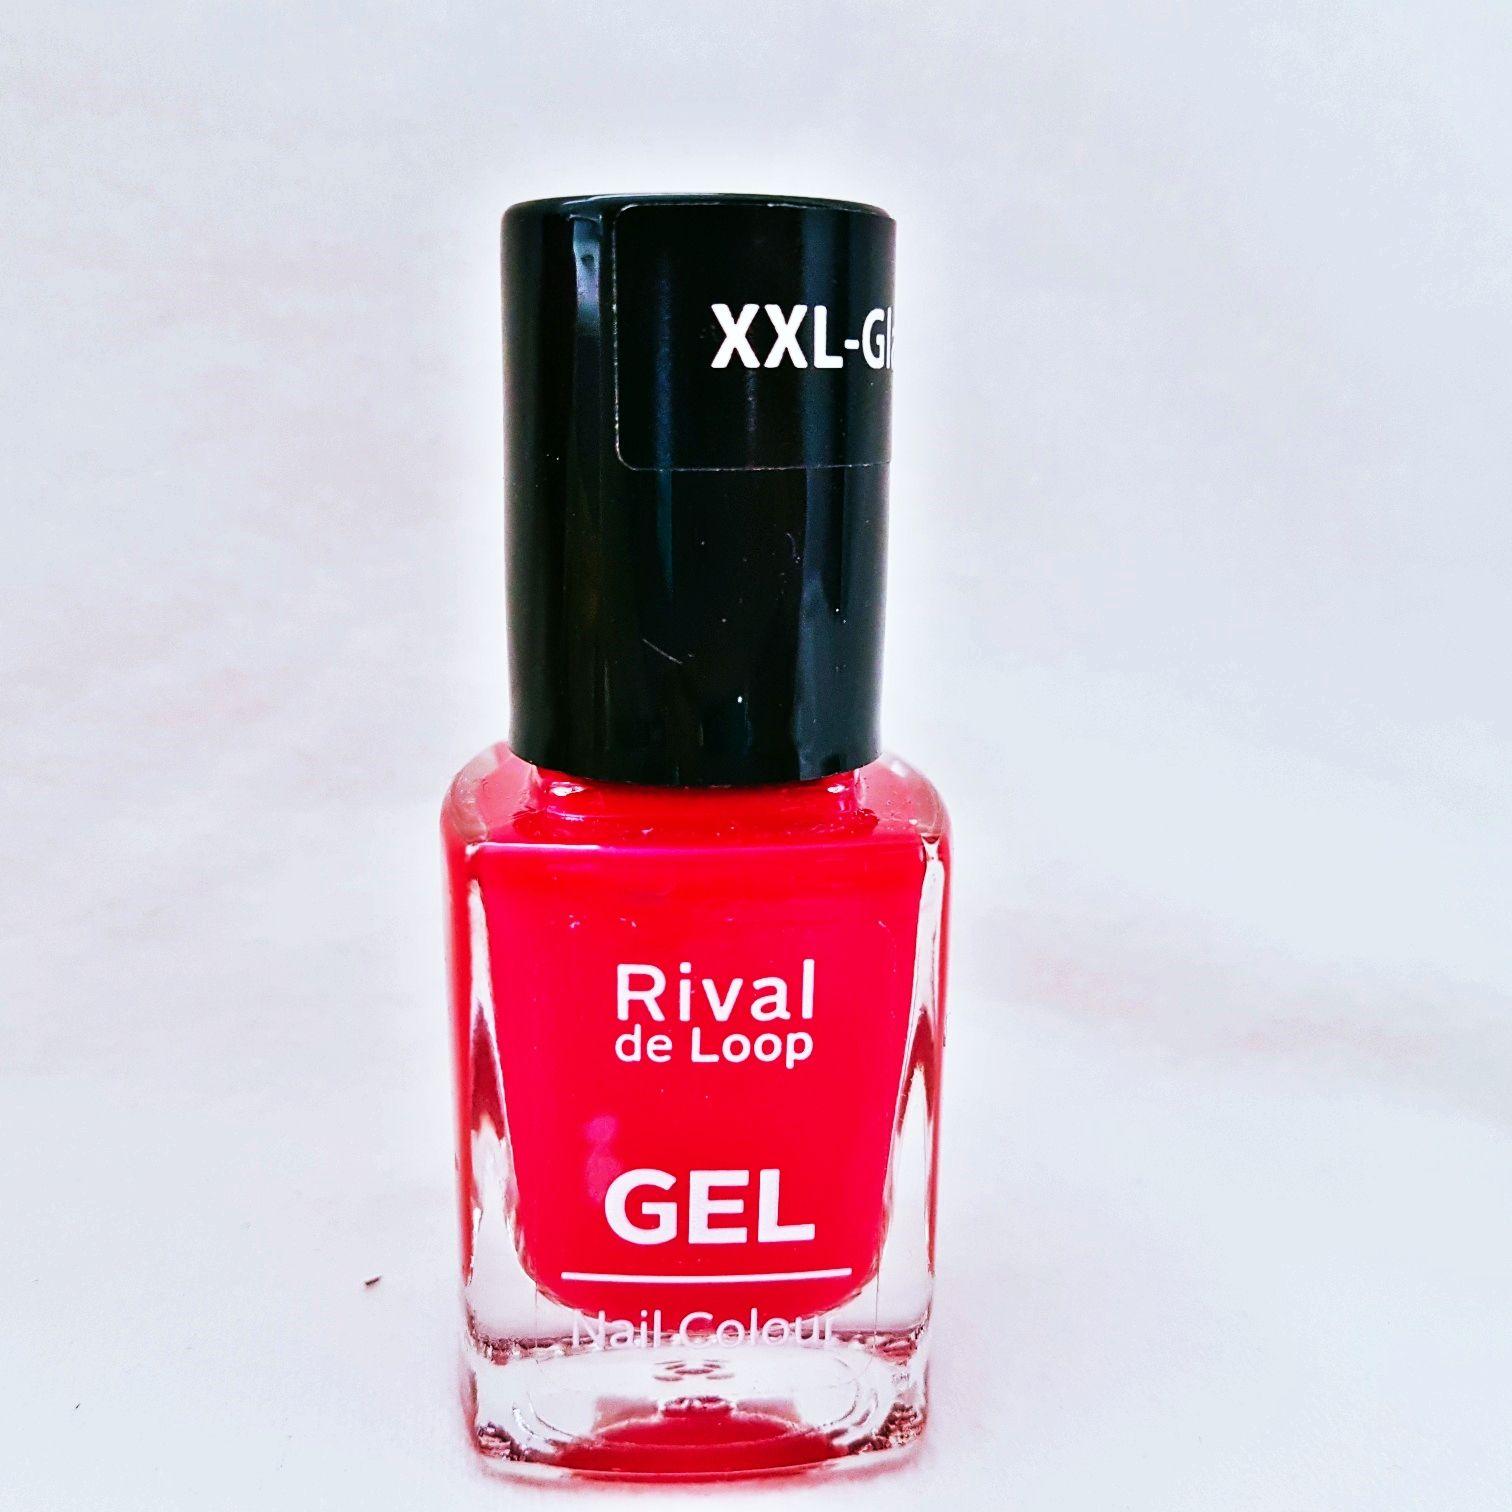 Rival de Loop Gel Nail Colour mit xxl-Glanz